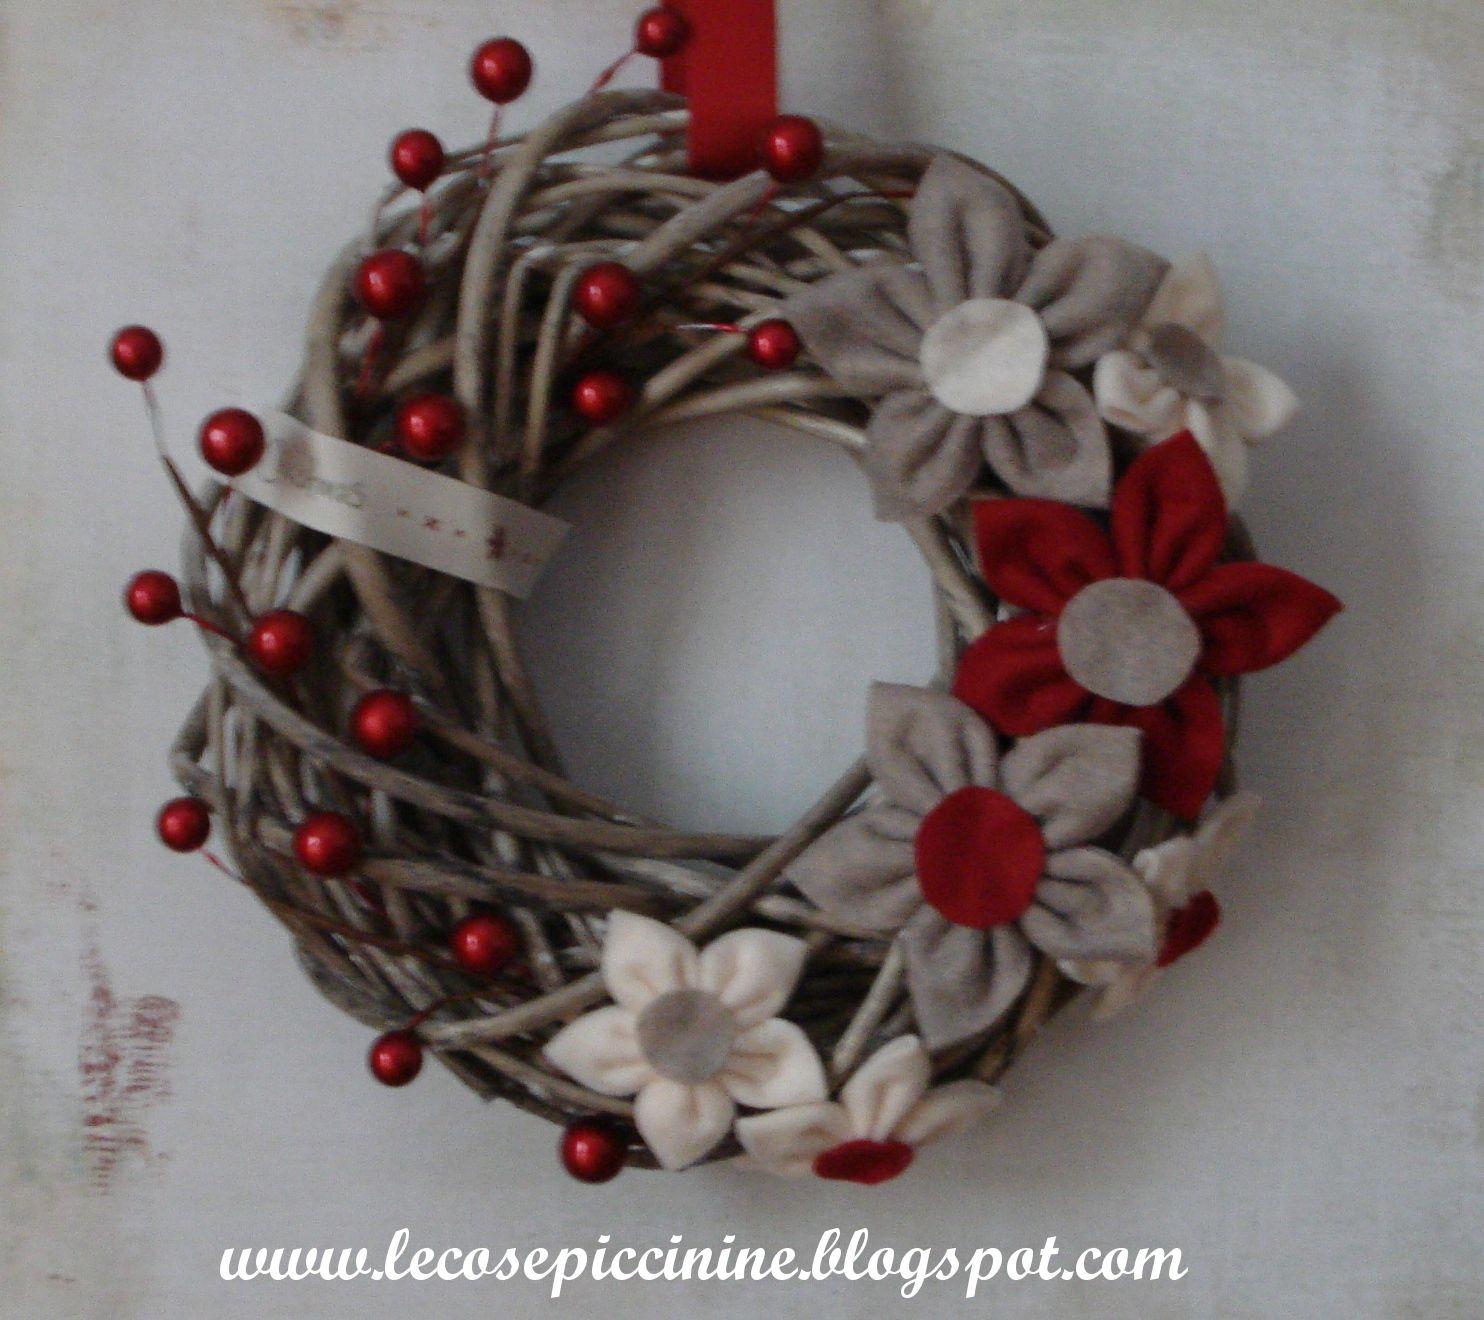 Le cose piccinine altra ghirlanda natalizia - Ghirlanda porta natale ...